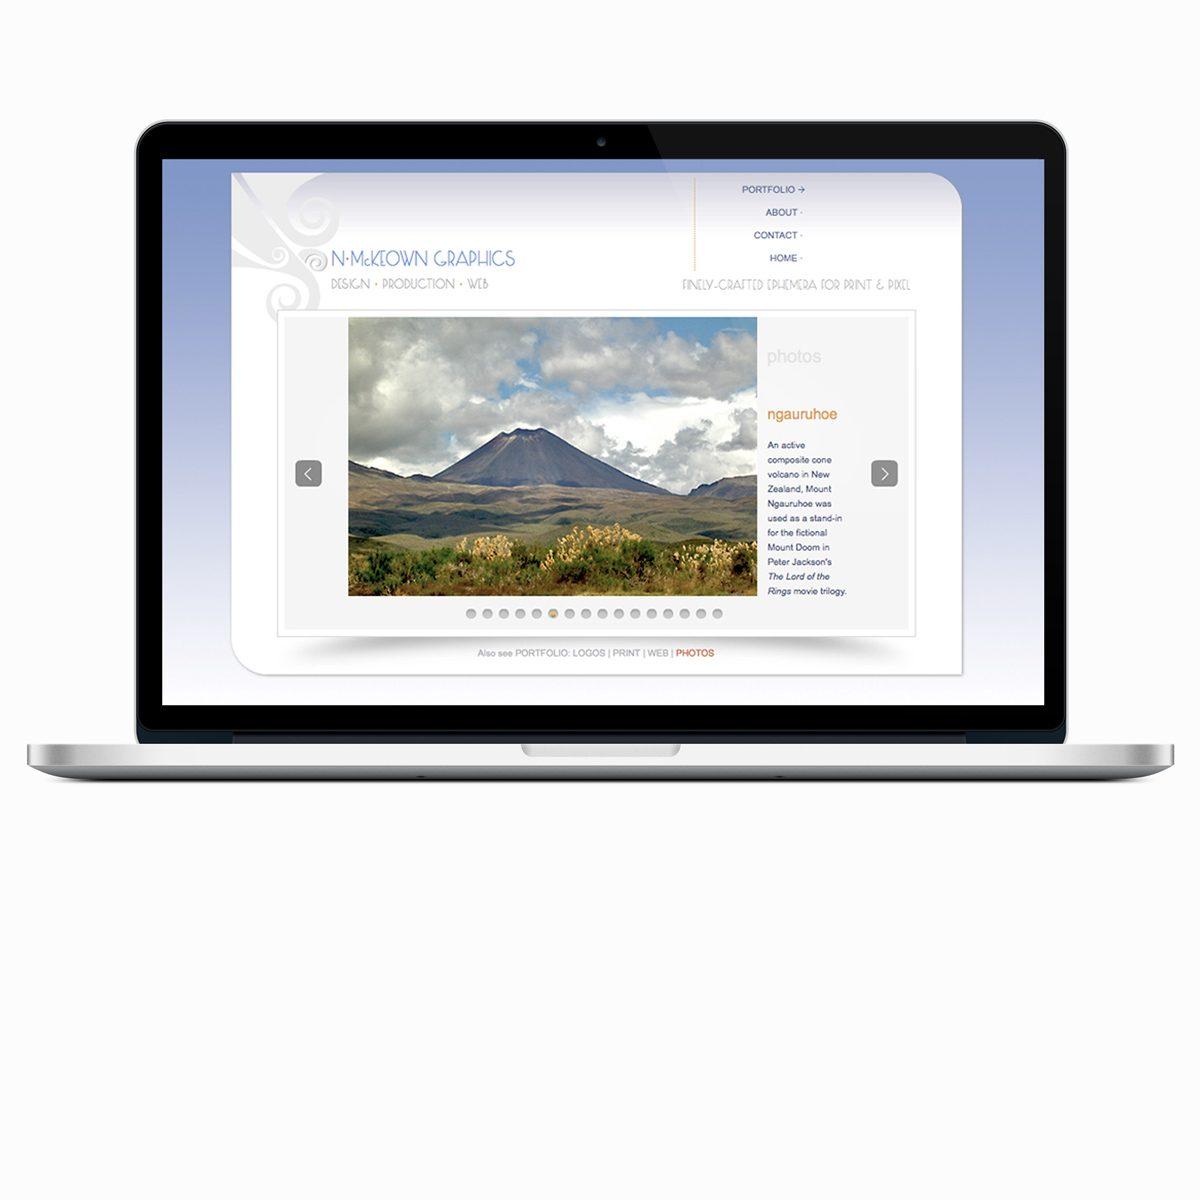 NMcKeown Graphics photography Javascript slider page